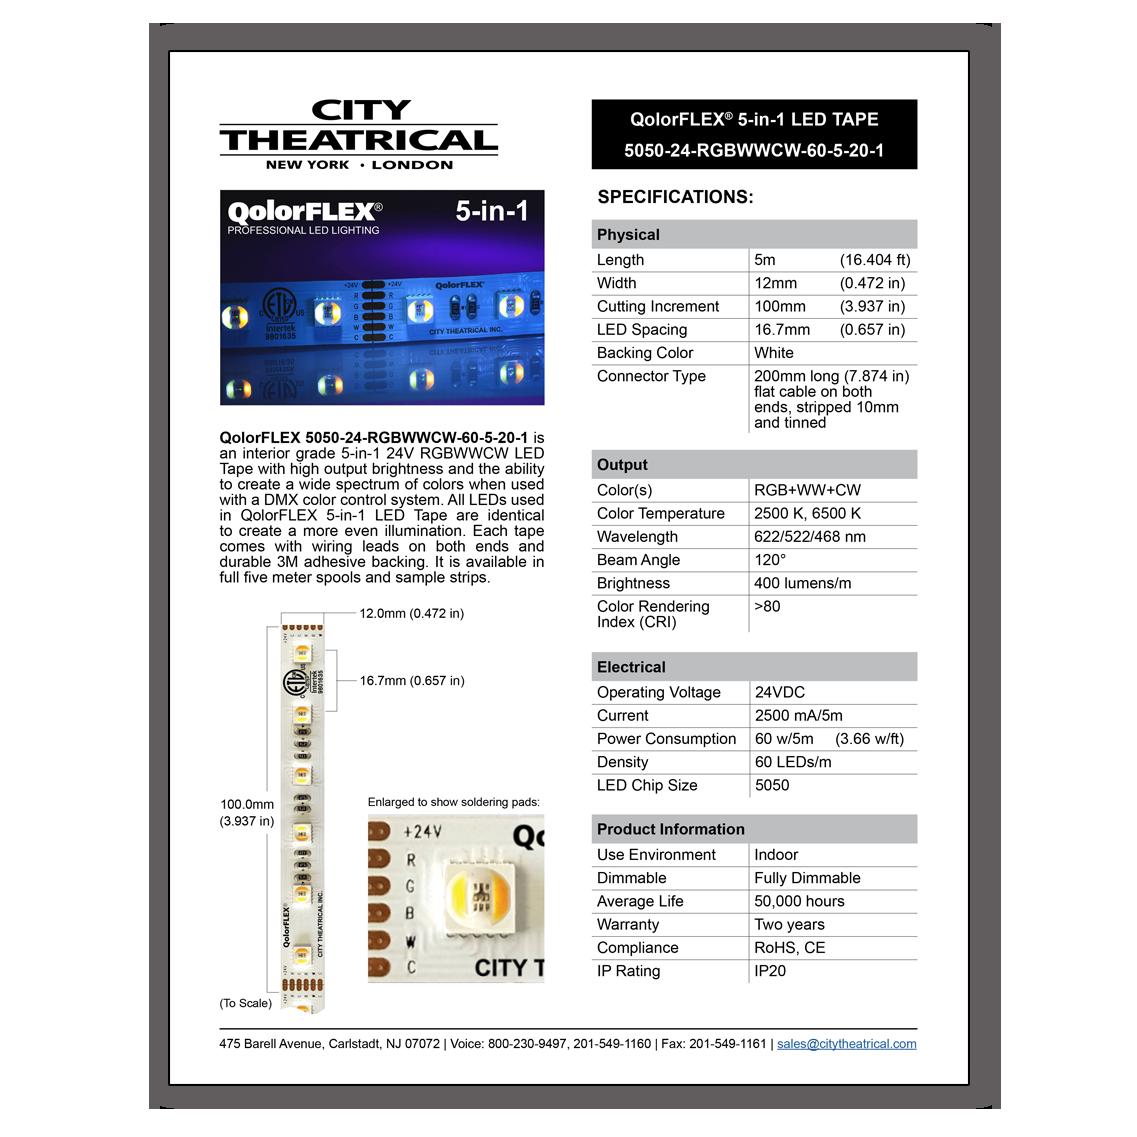 QolorFLEX-5-in-1 LED Tape Cut Sheet